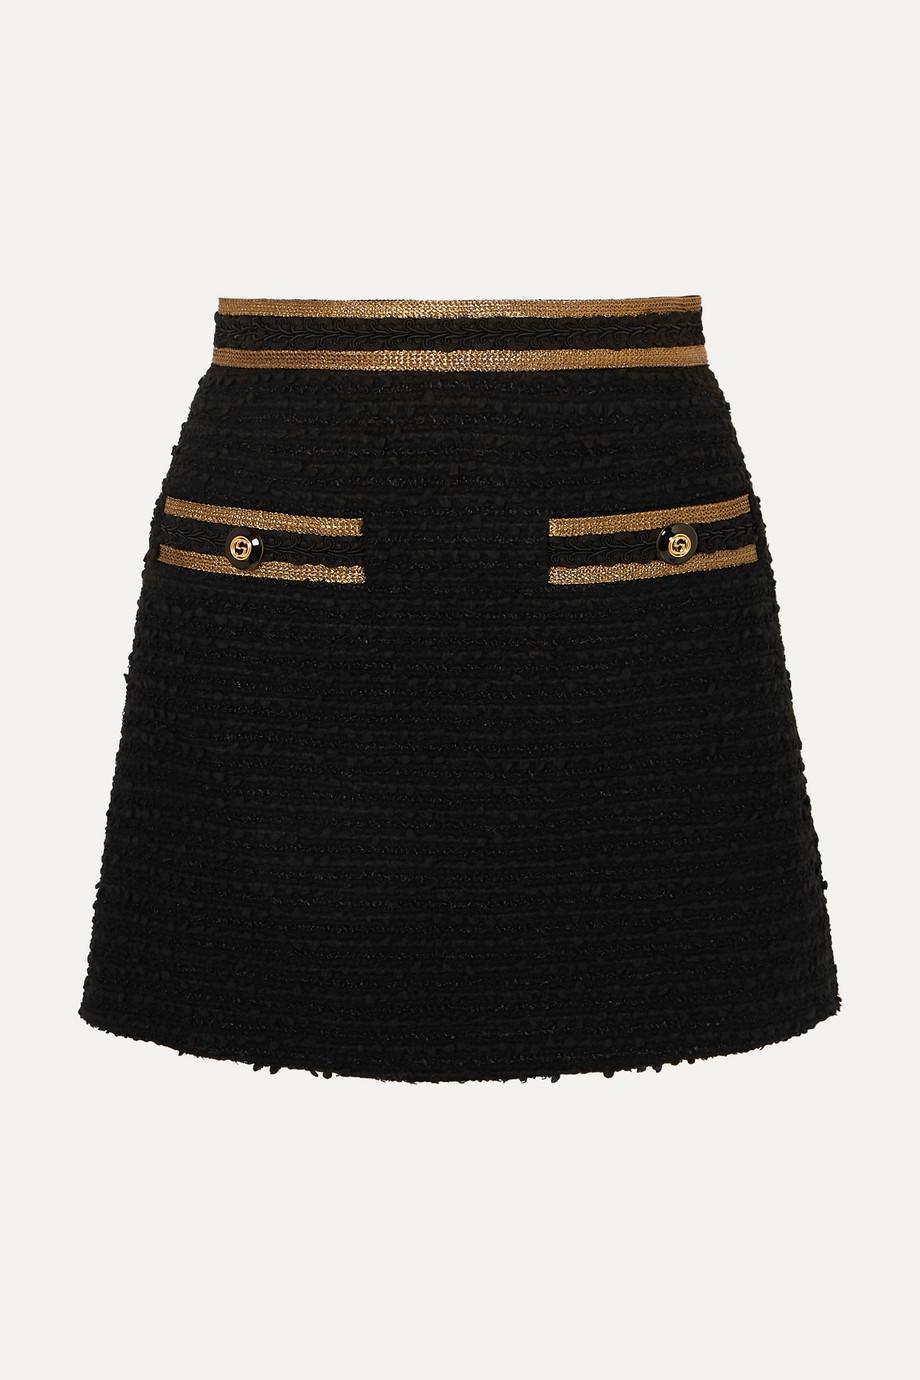 Gucci Metallic-trimmed cotton-blend tweed mini skirt